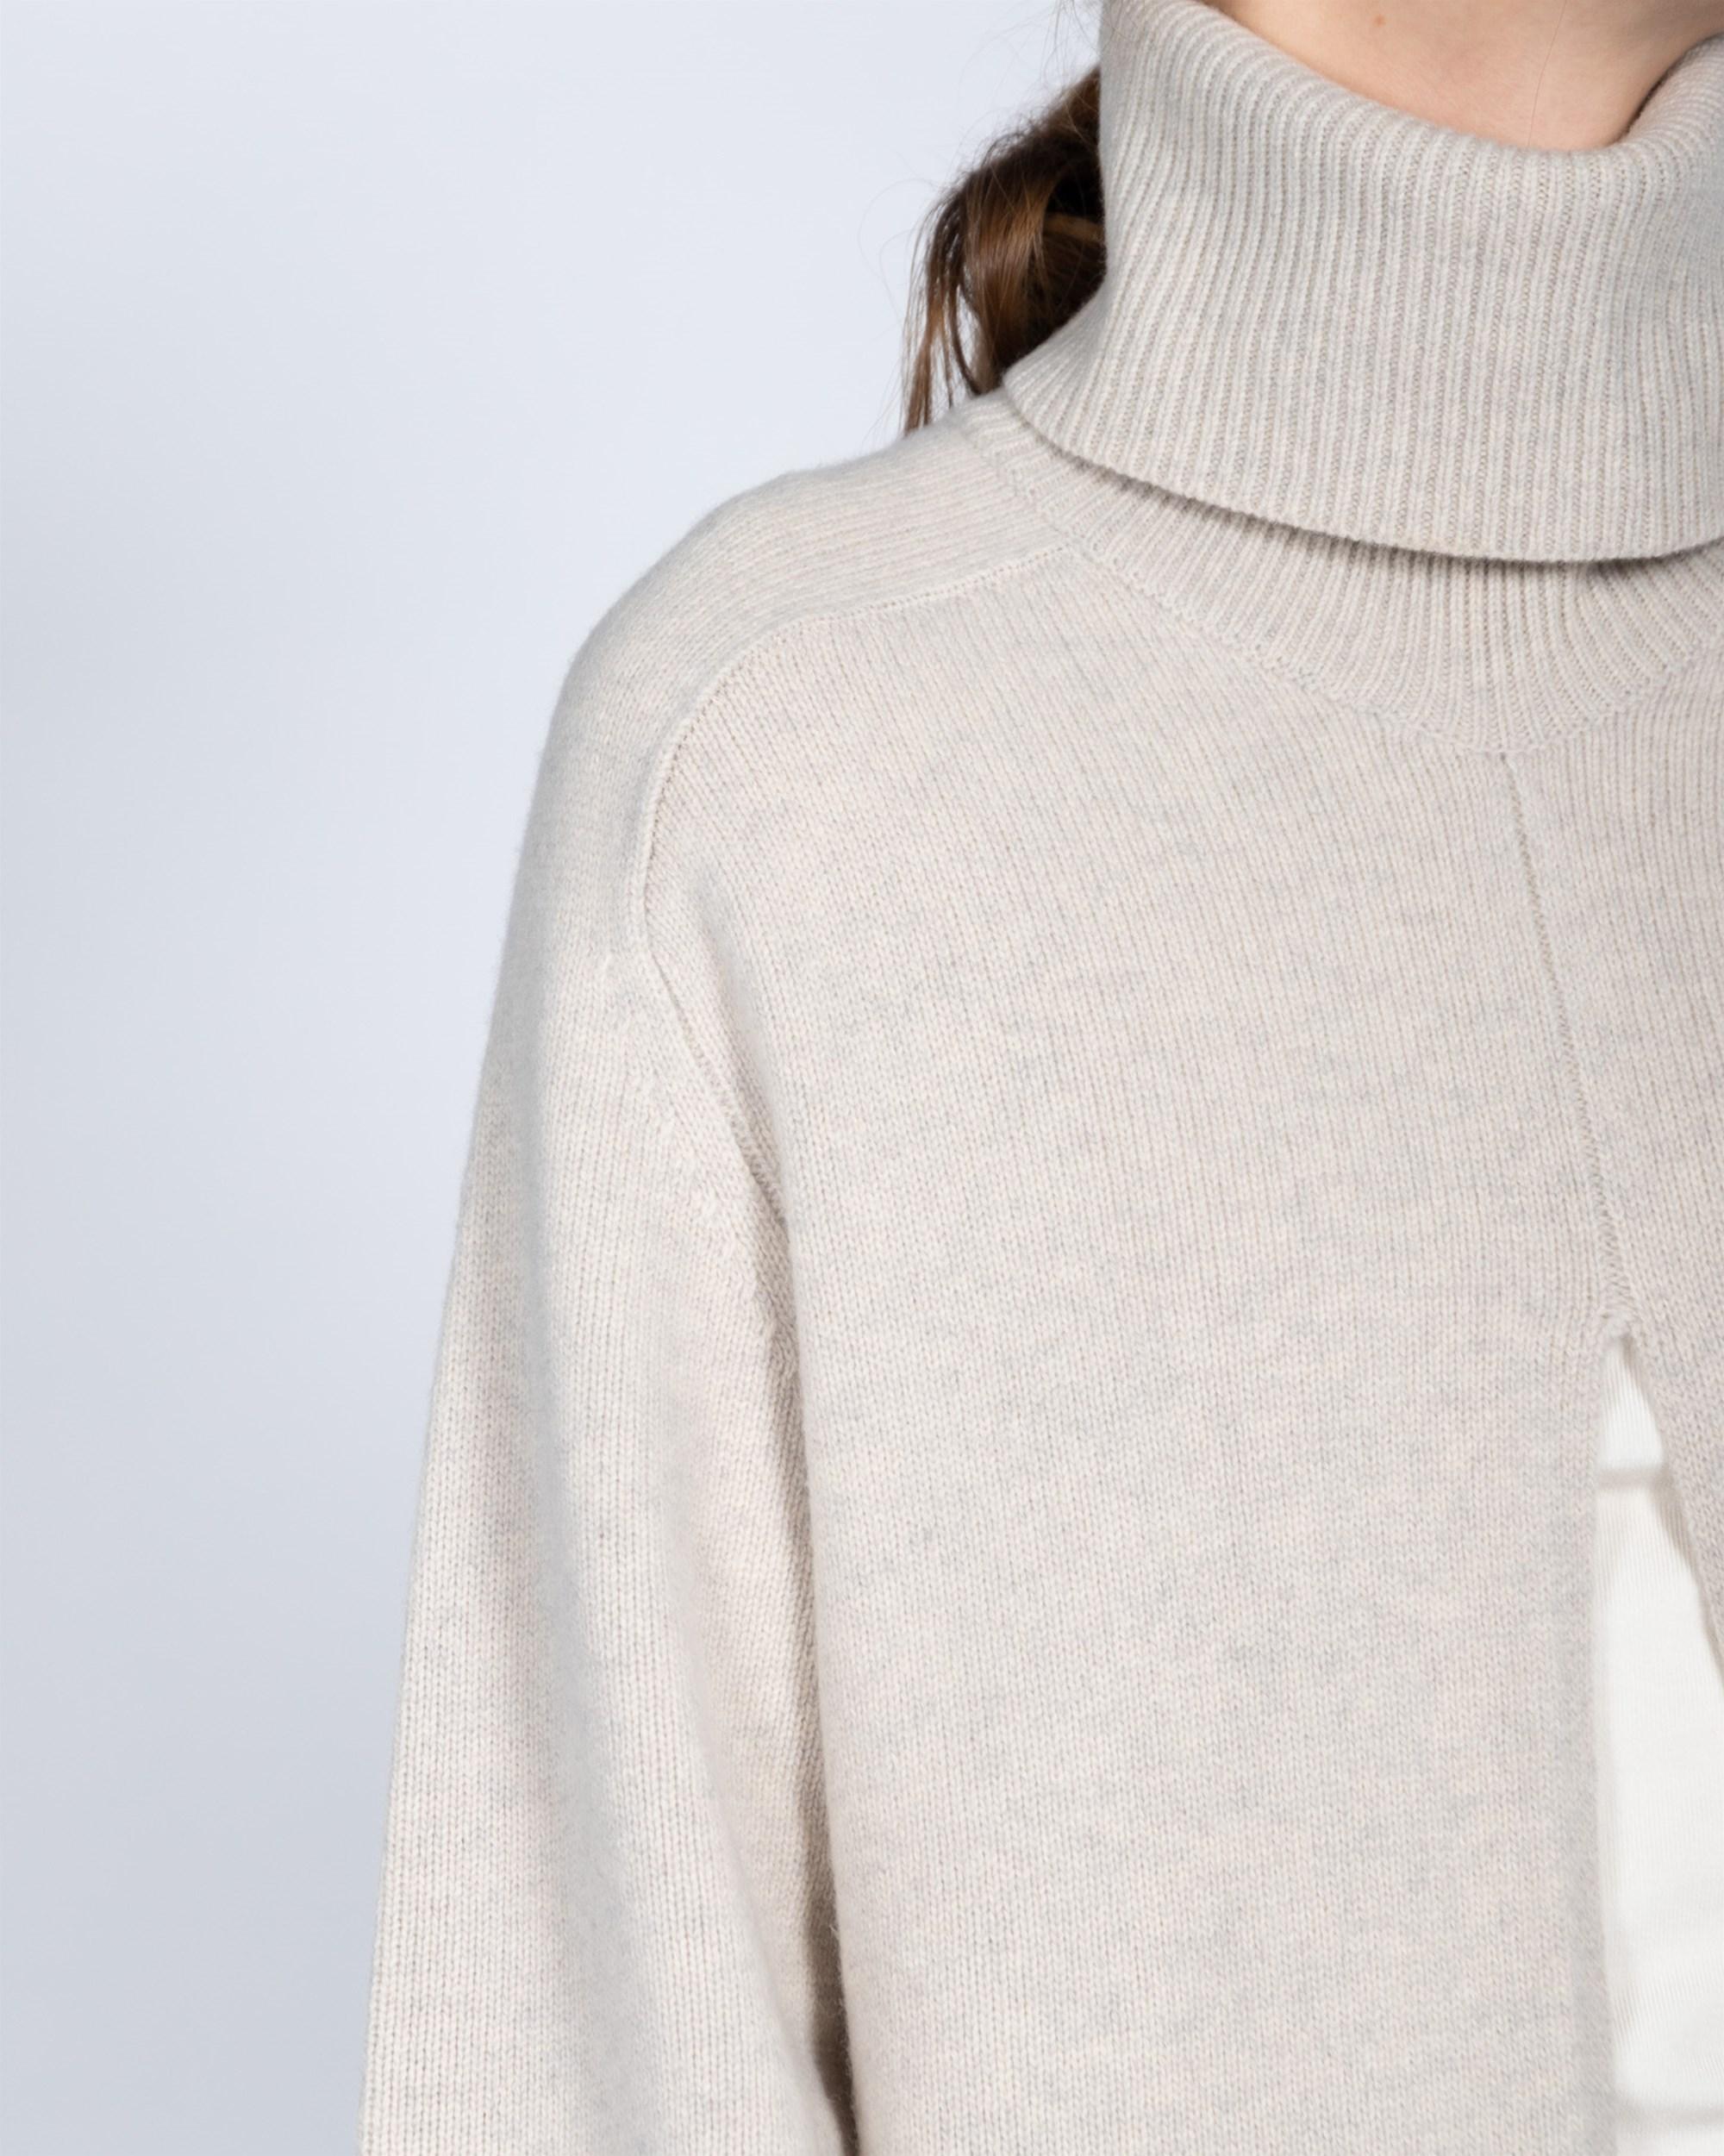 Short boucl\u00e8 wool dress